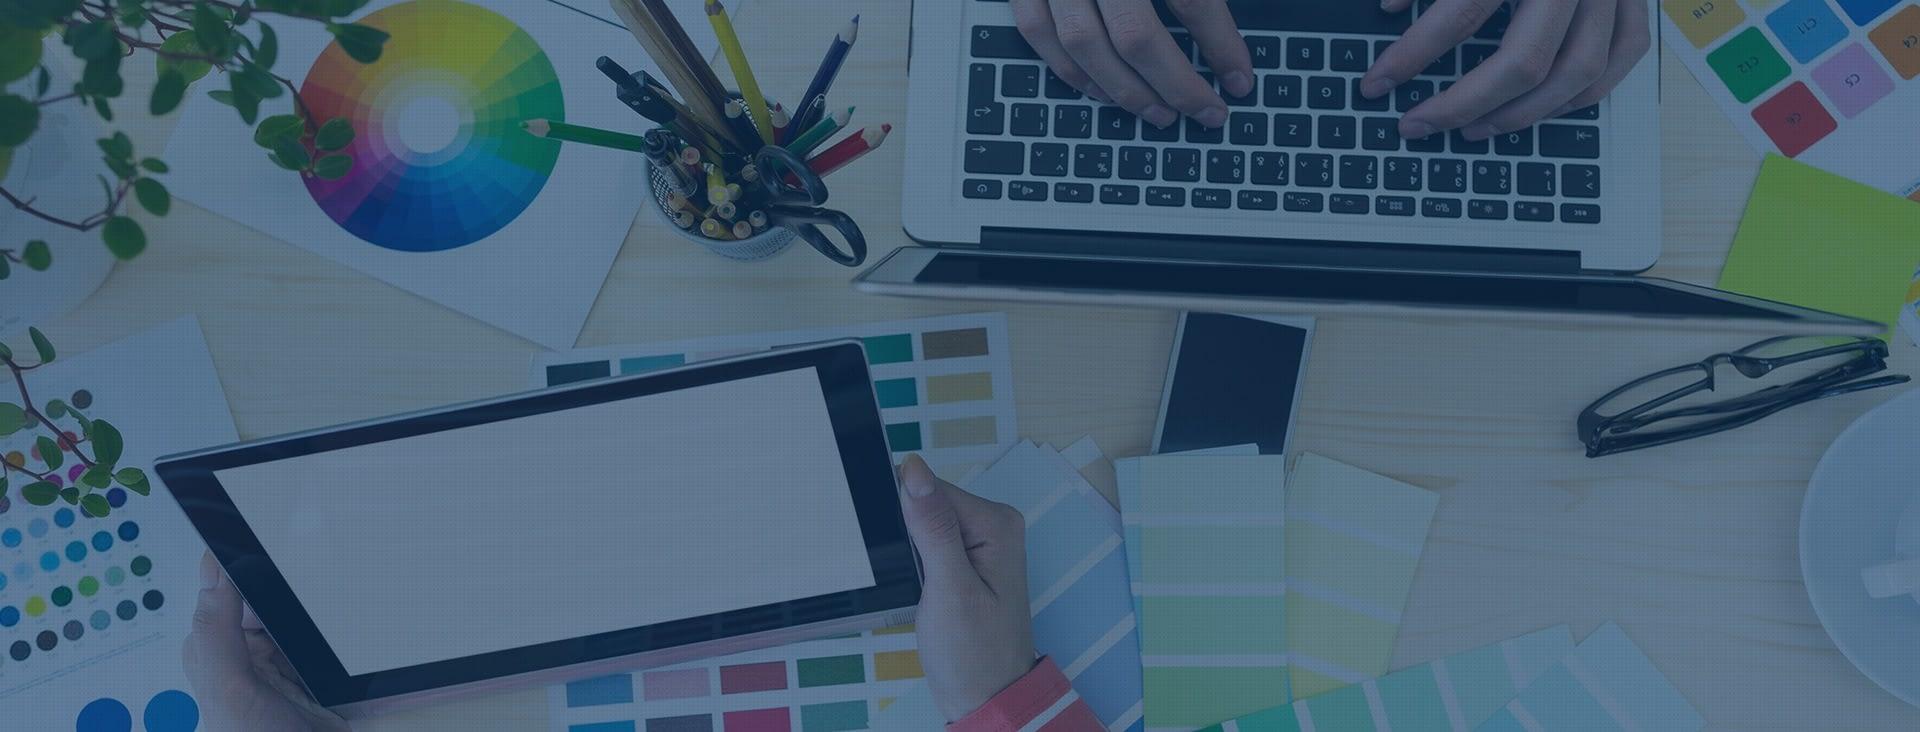 Varemar Offers Custom Website Design Services In New Jersey